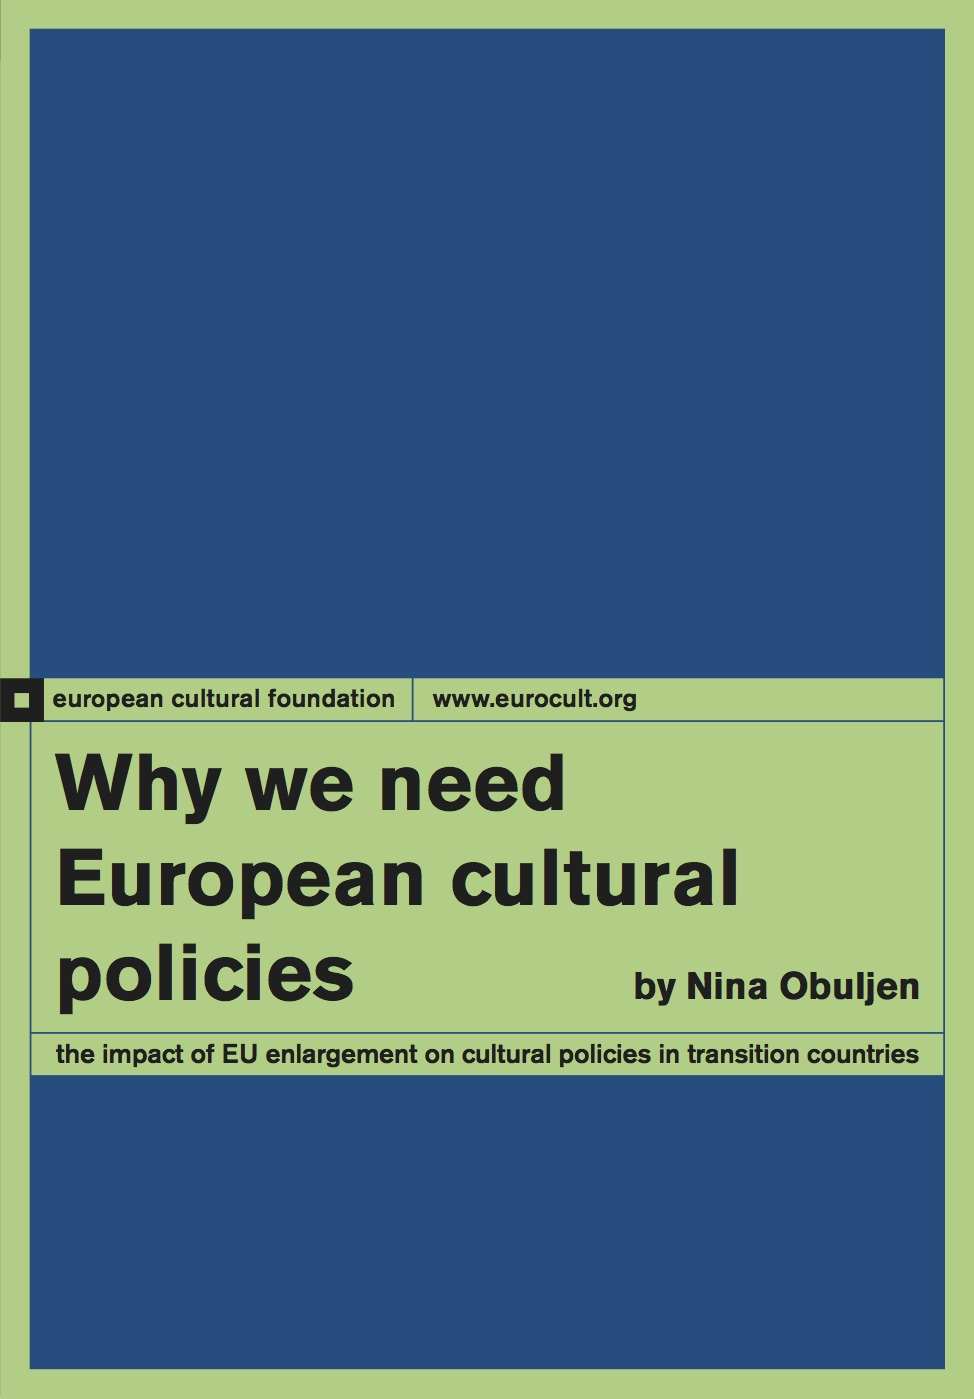 why_we_need_european_cultural_policies.jpg